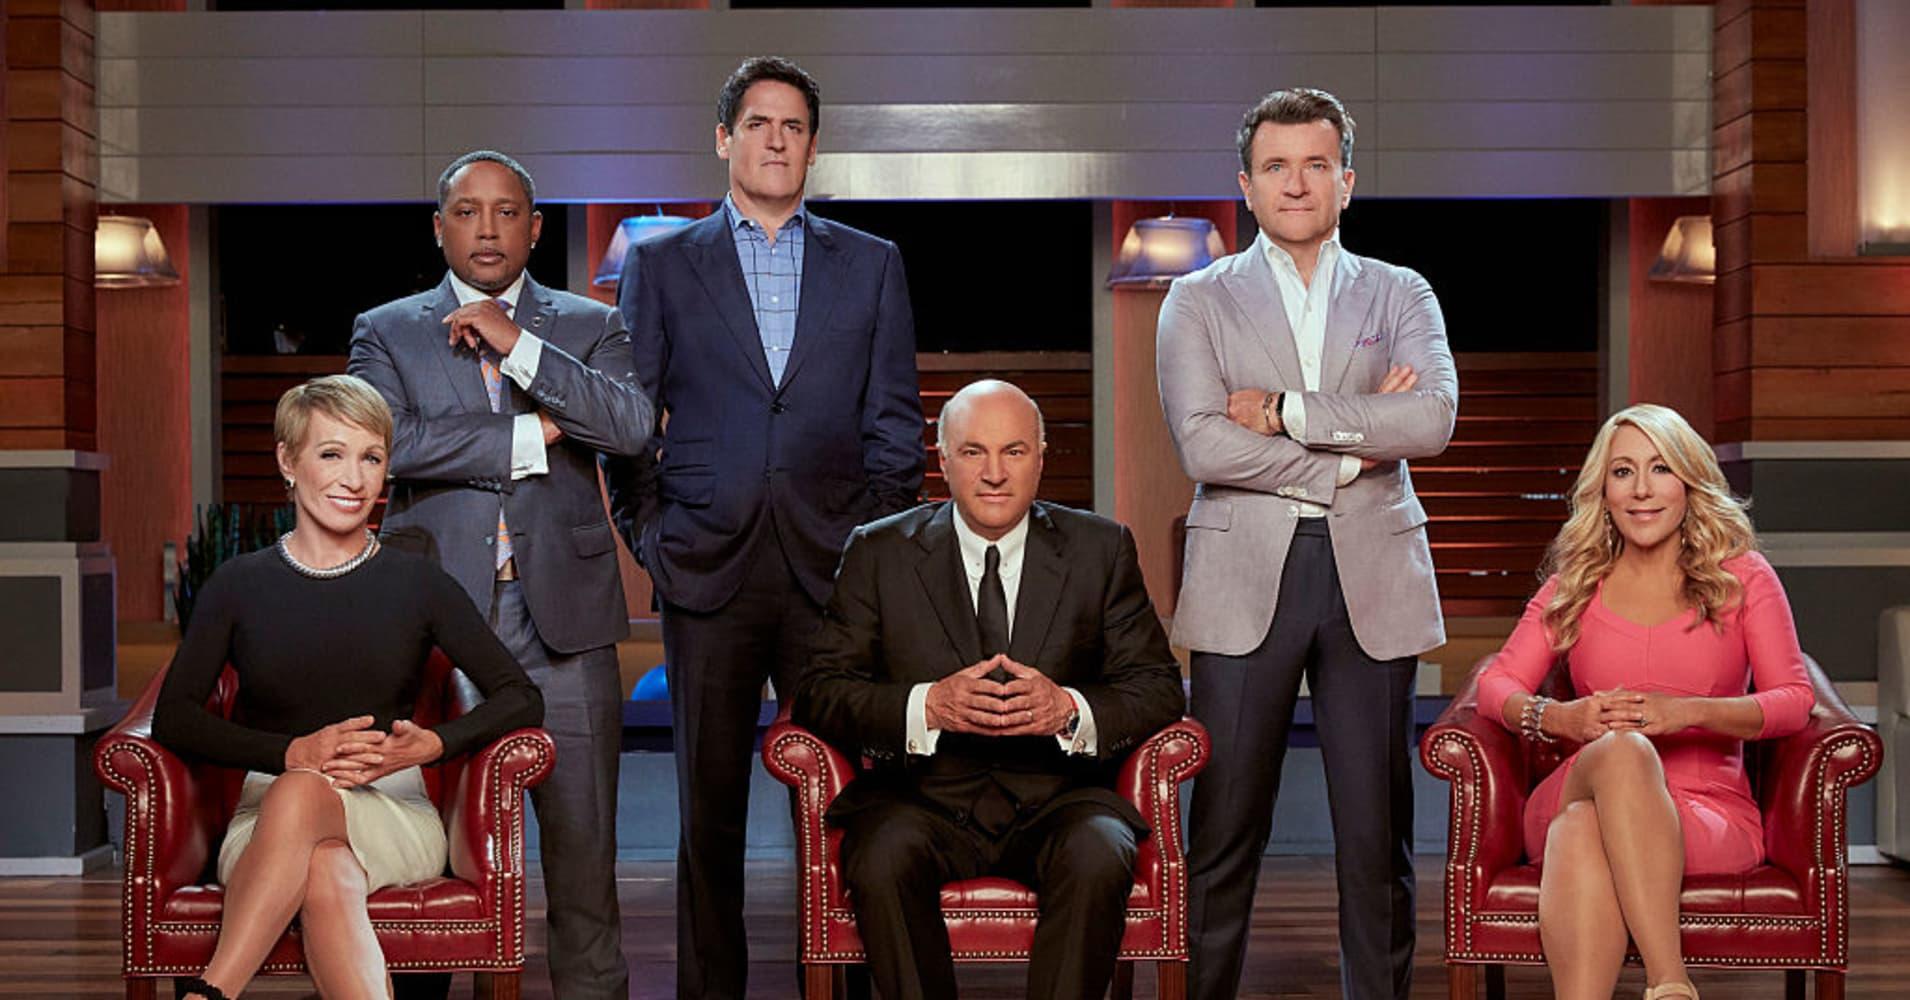 The Sharks of season eight:  Barbara Corcoran, Daymond John, Mark Cuban, Kevin O'Leary, Robert Herjavec and Lori Greiner.